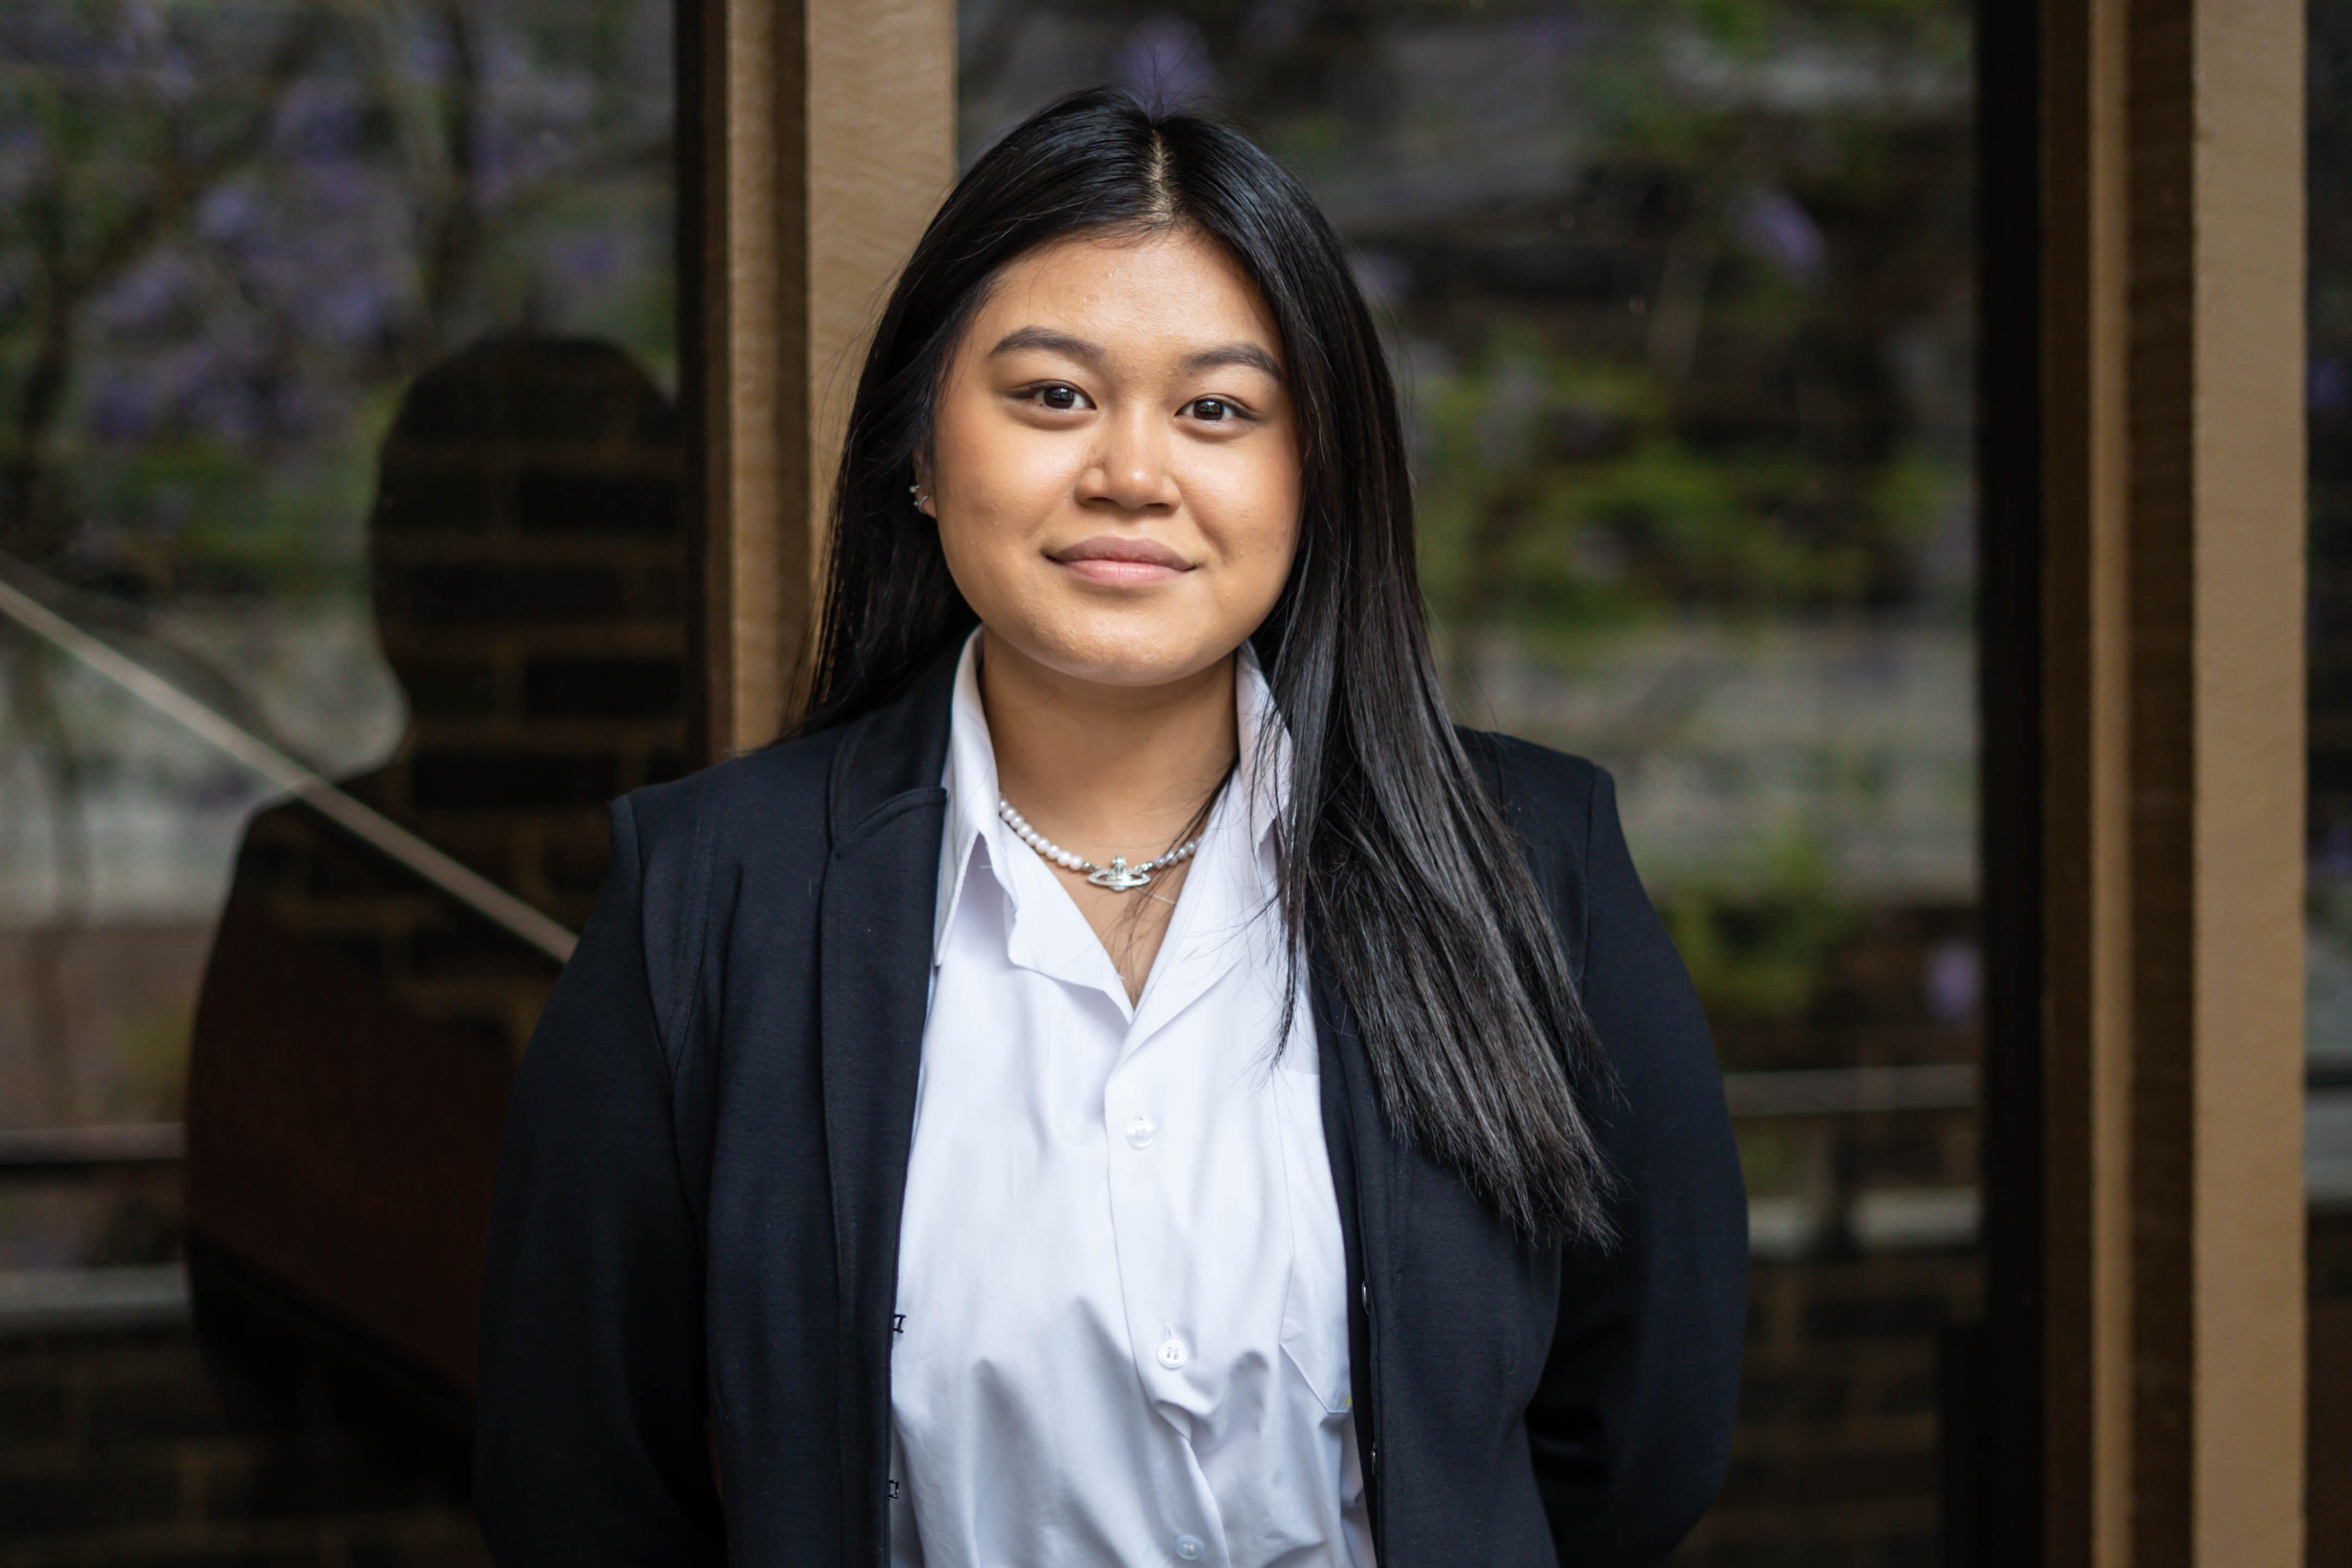 Aimie Phu